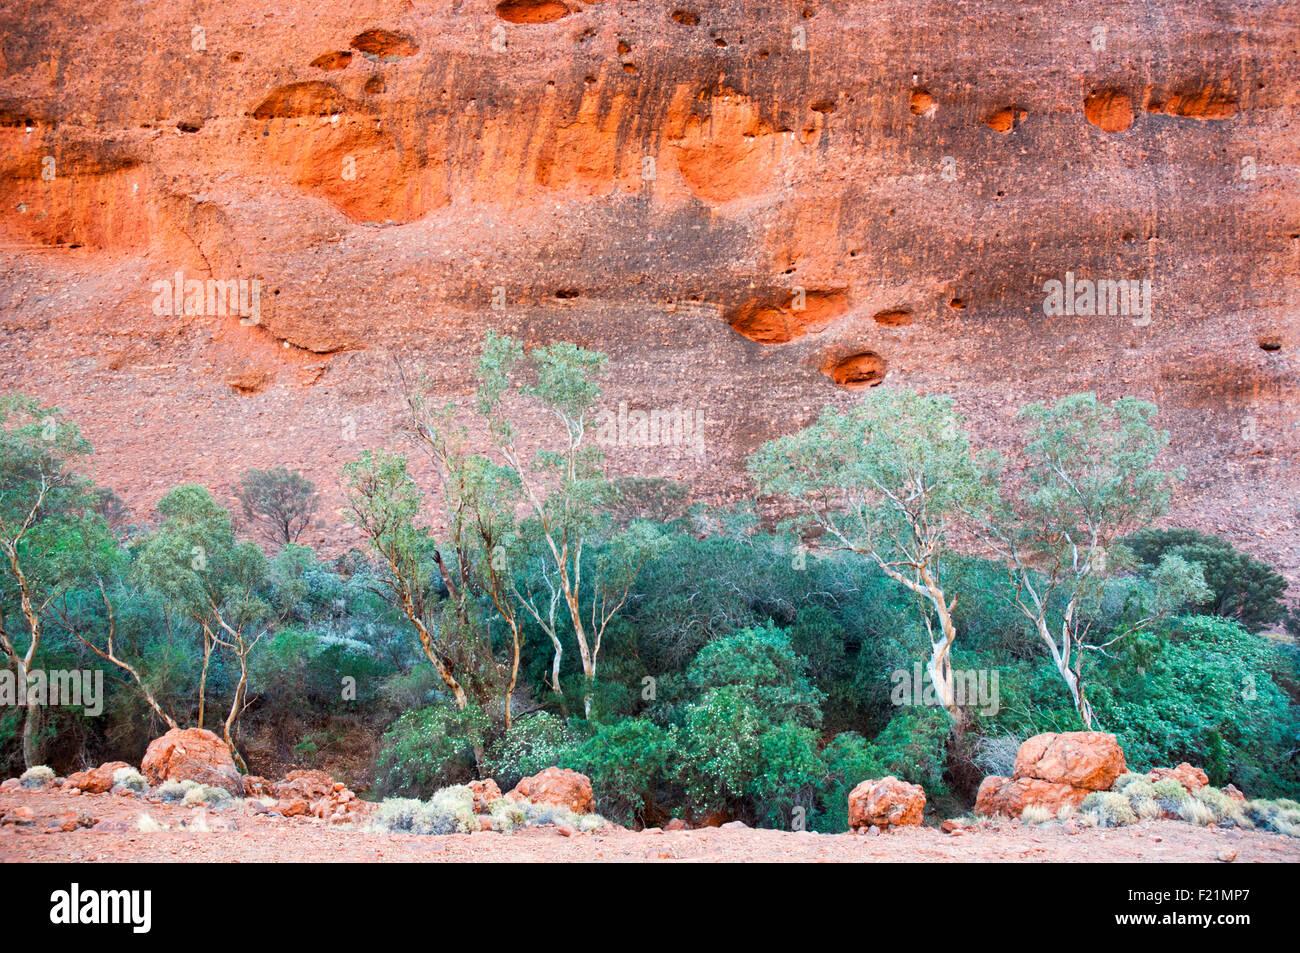 Tôt le matin à Walpa Gorge, Kata Tjuta (les Olgas), Centre de l'Australie Photo Stock